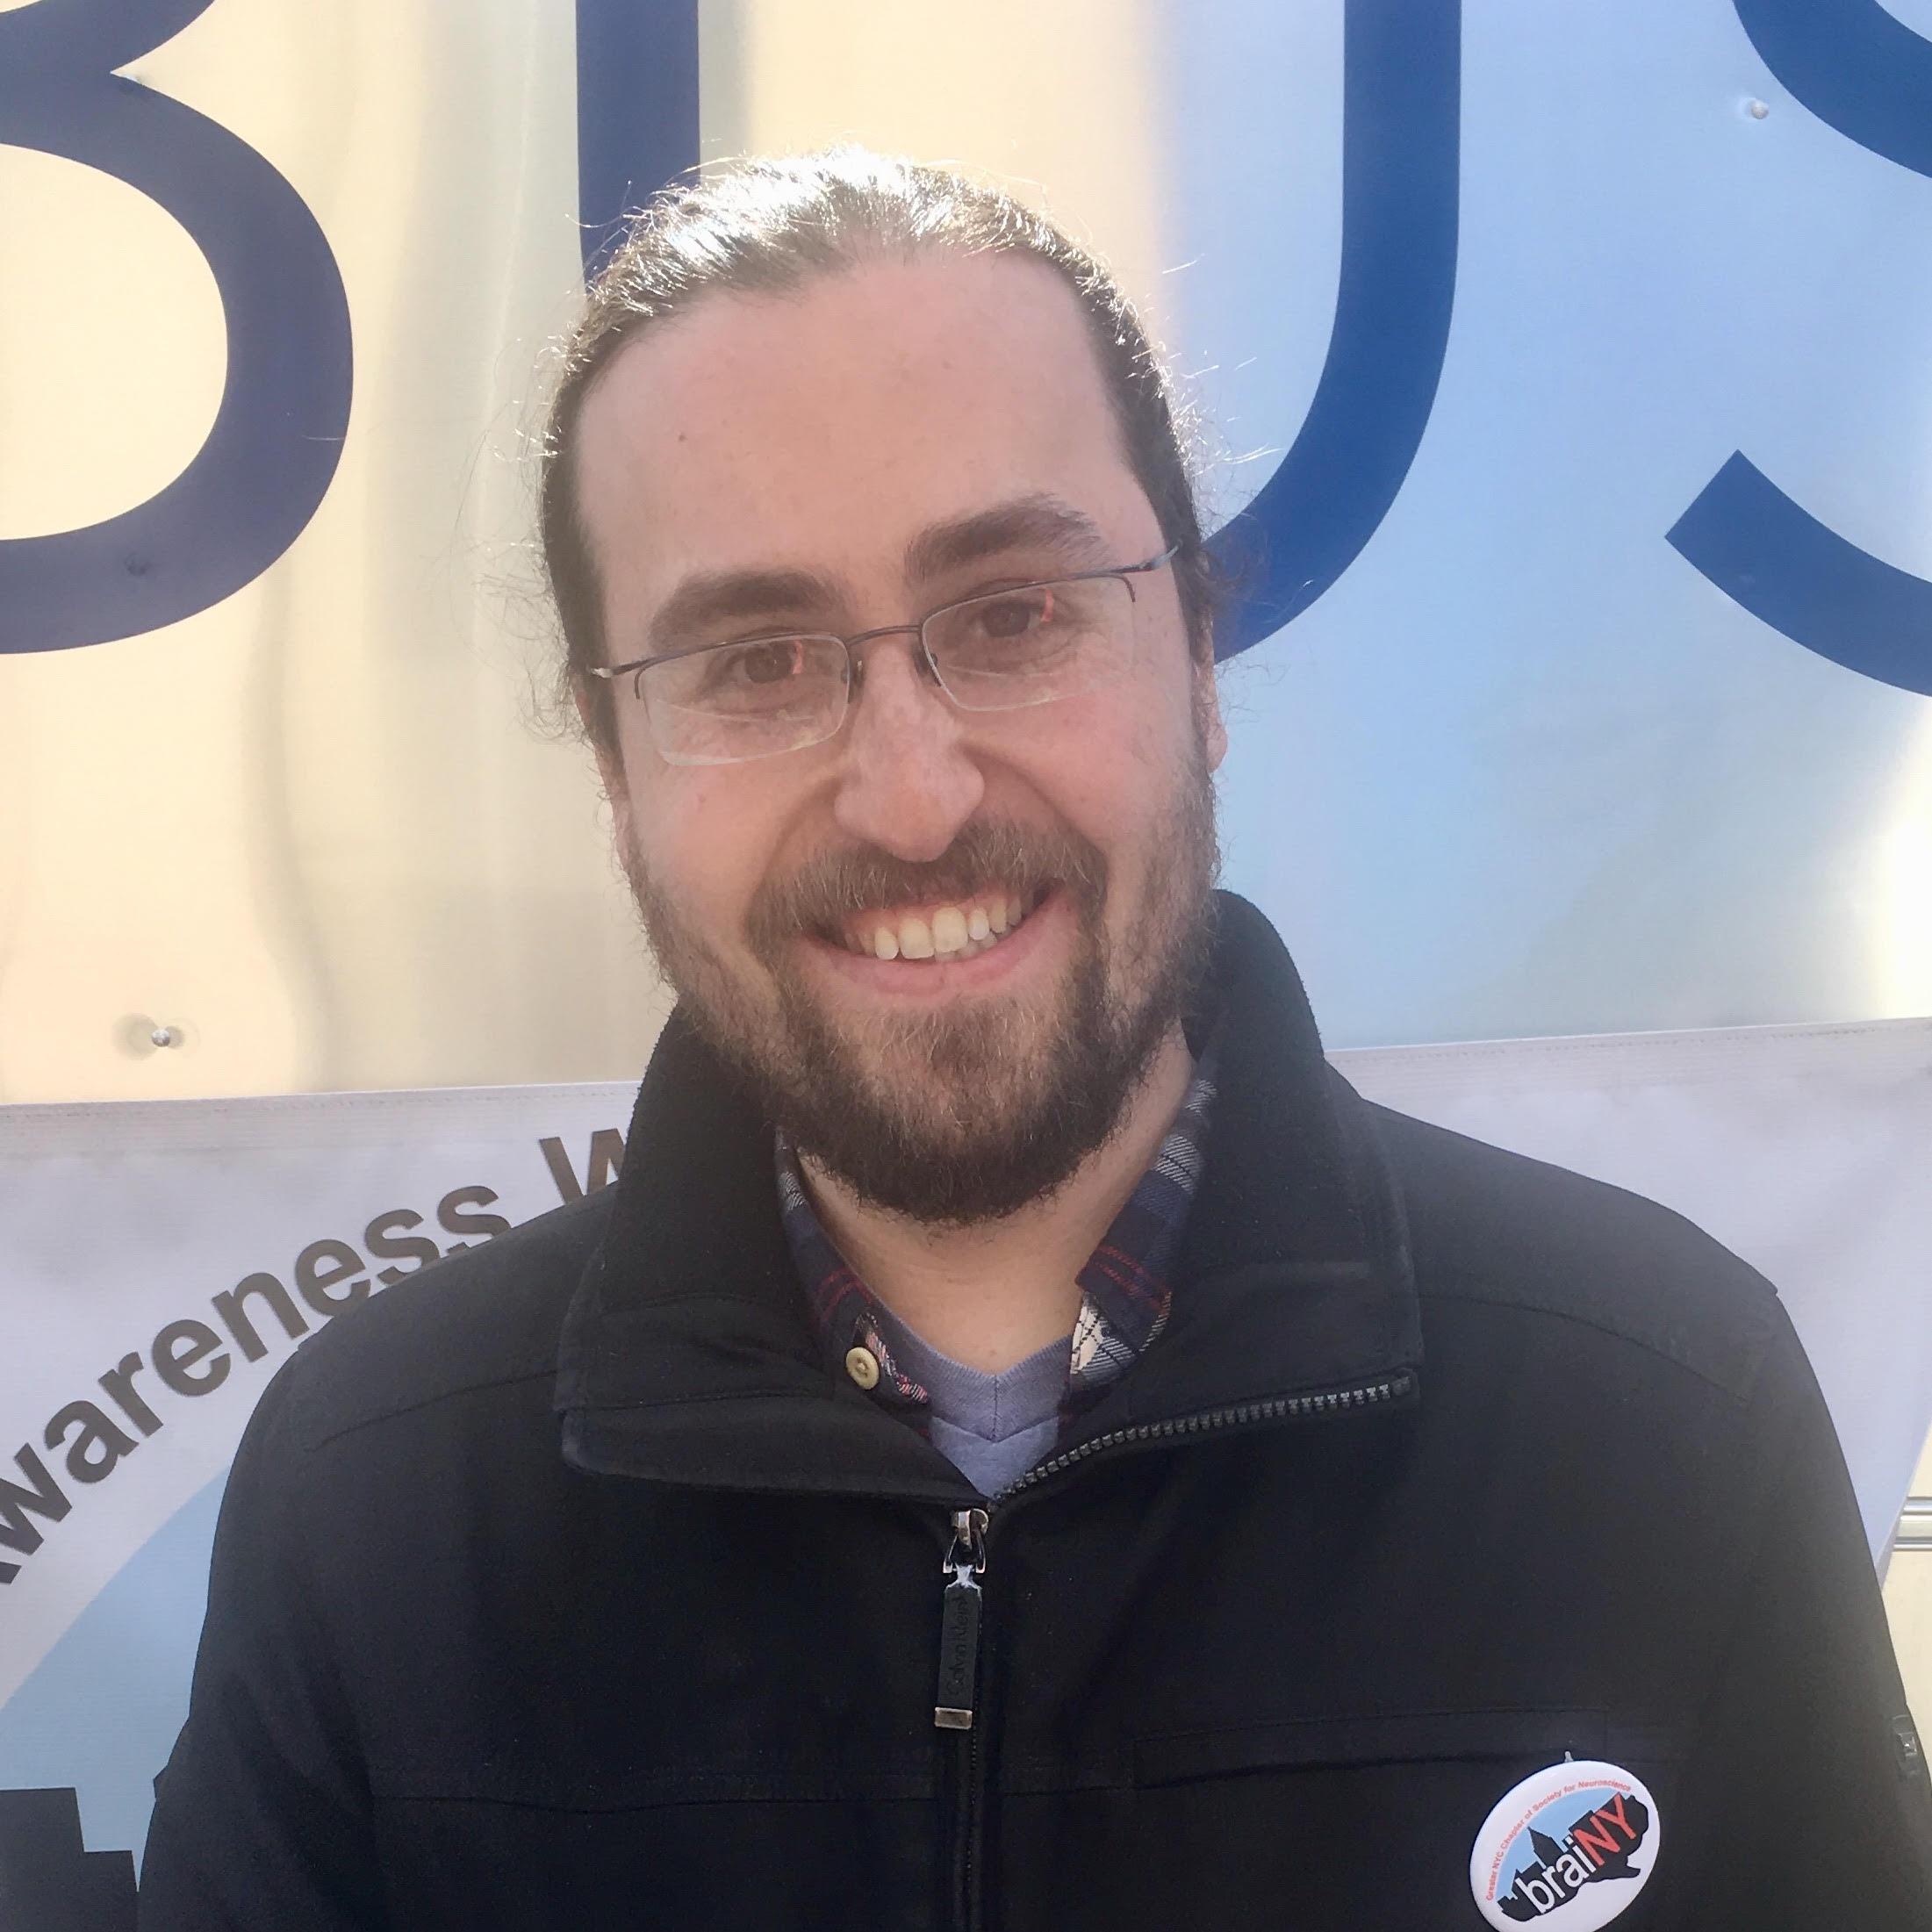 Headshot of Michael Epstein